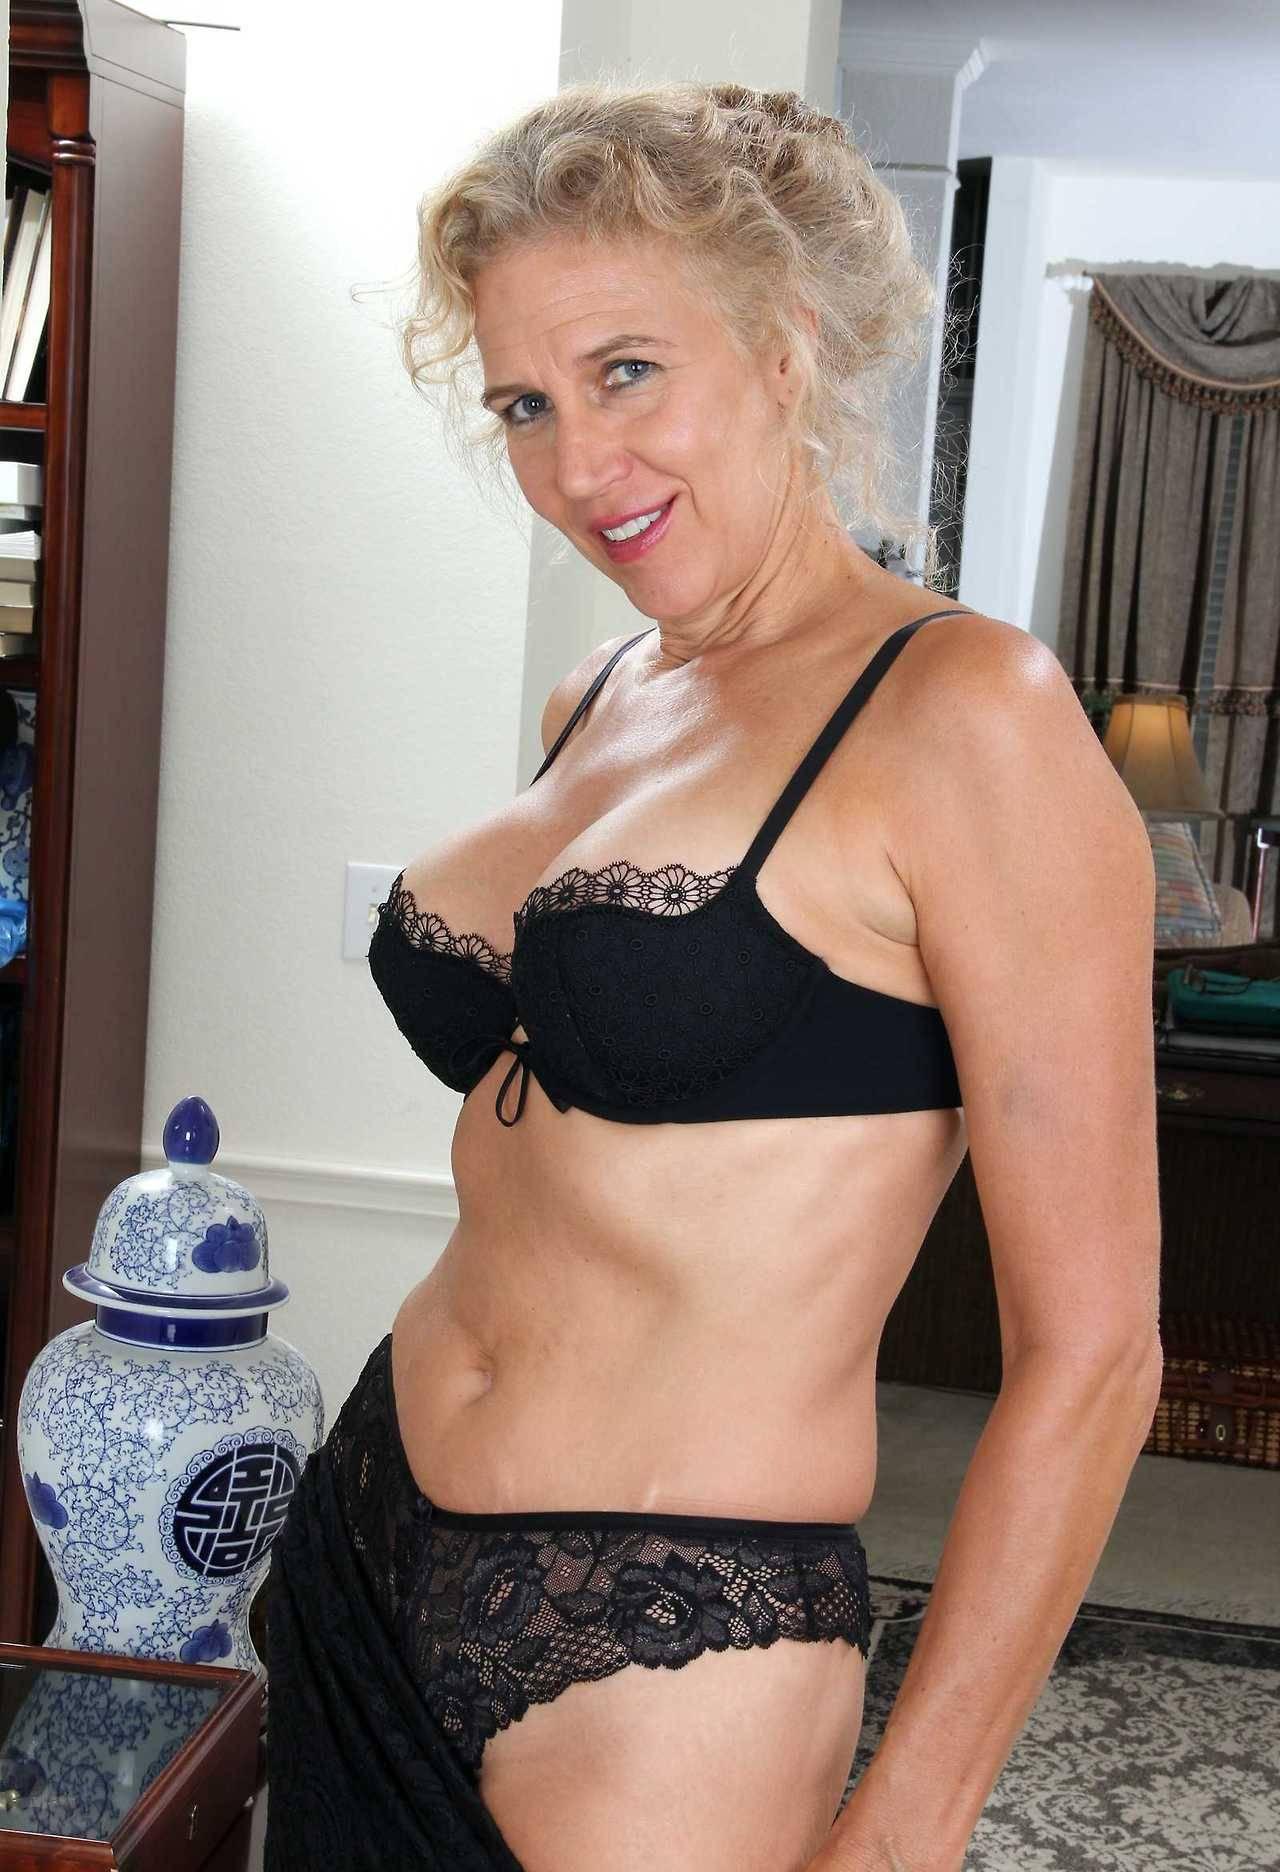 Marria 60 Seeking Woman To Spanish Man 65